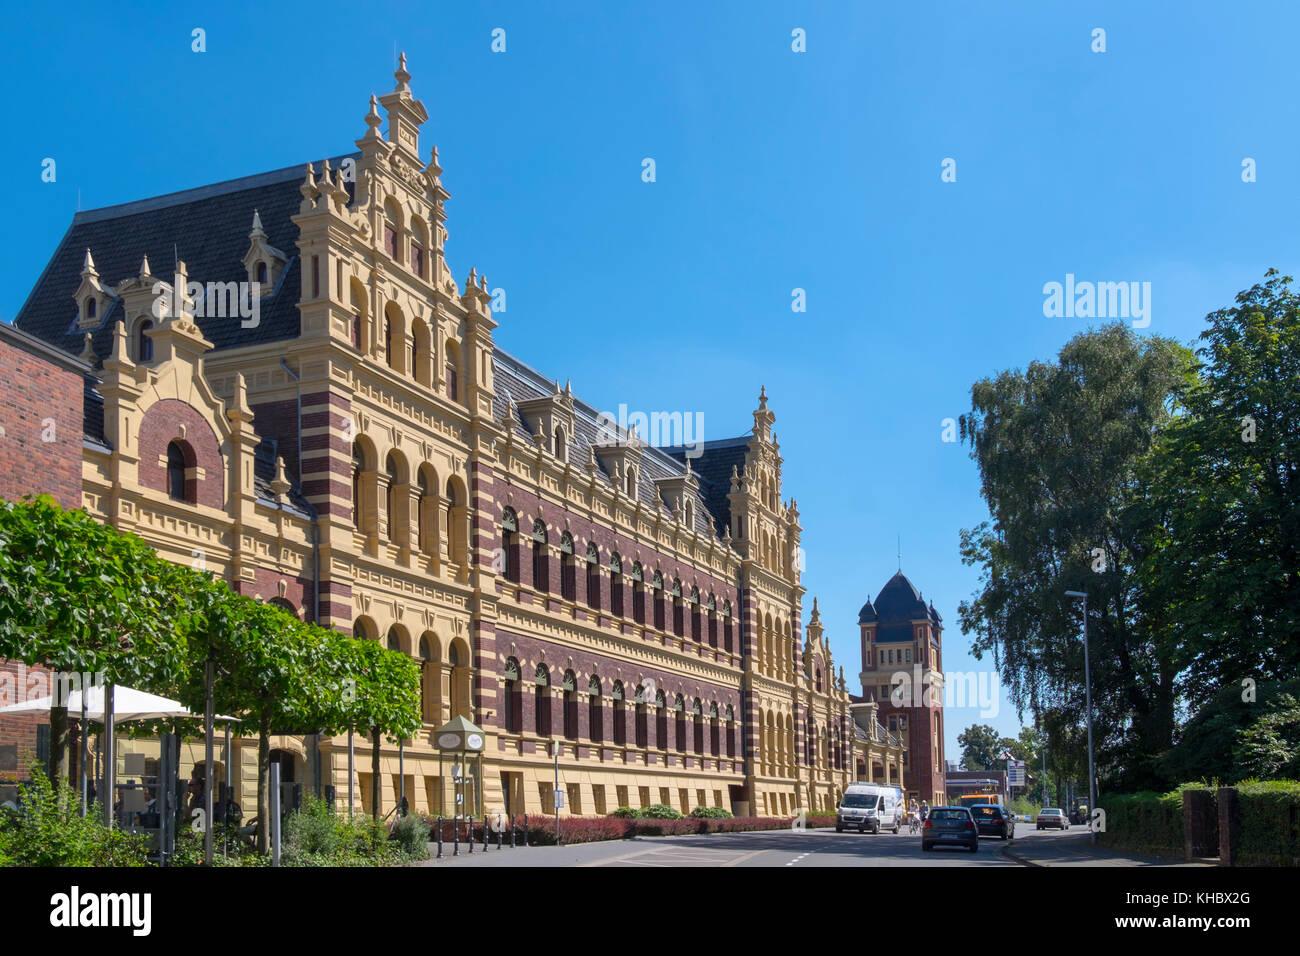 Beltman building, Dutch Renaissance, architect Gerrit Beltman, Münsterland, North Rhine-Westphalia, Germany - Stock Image